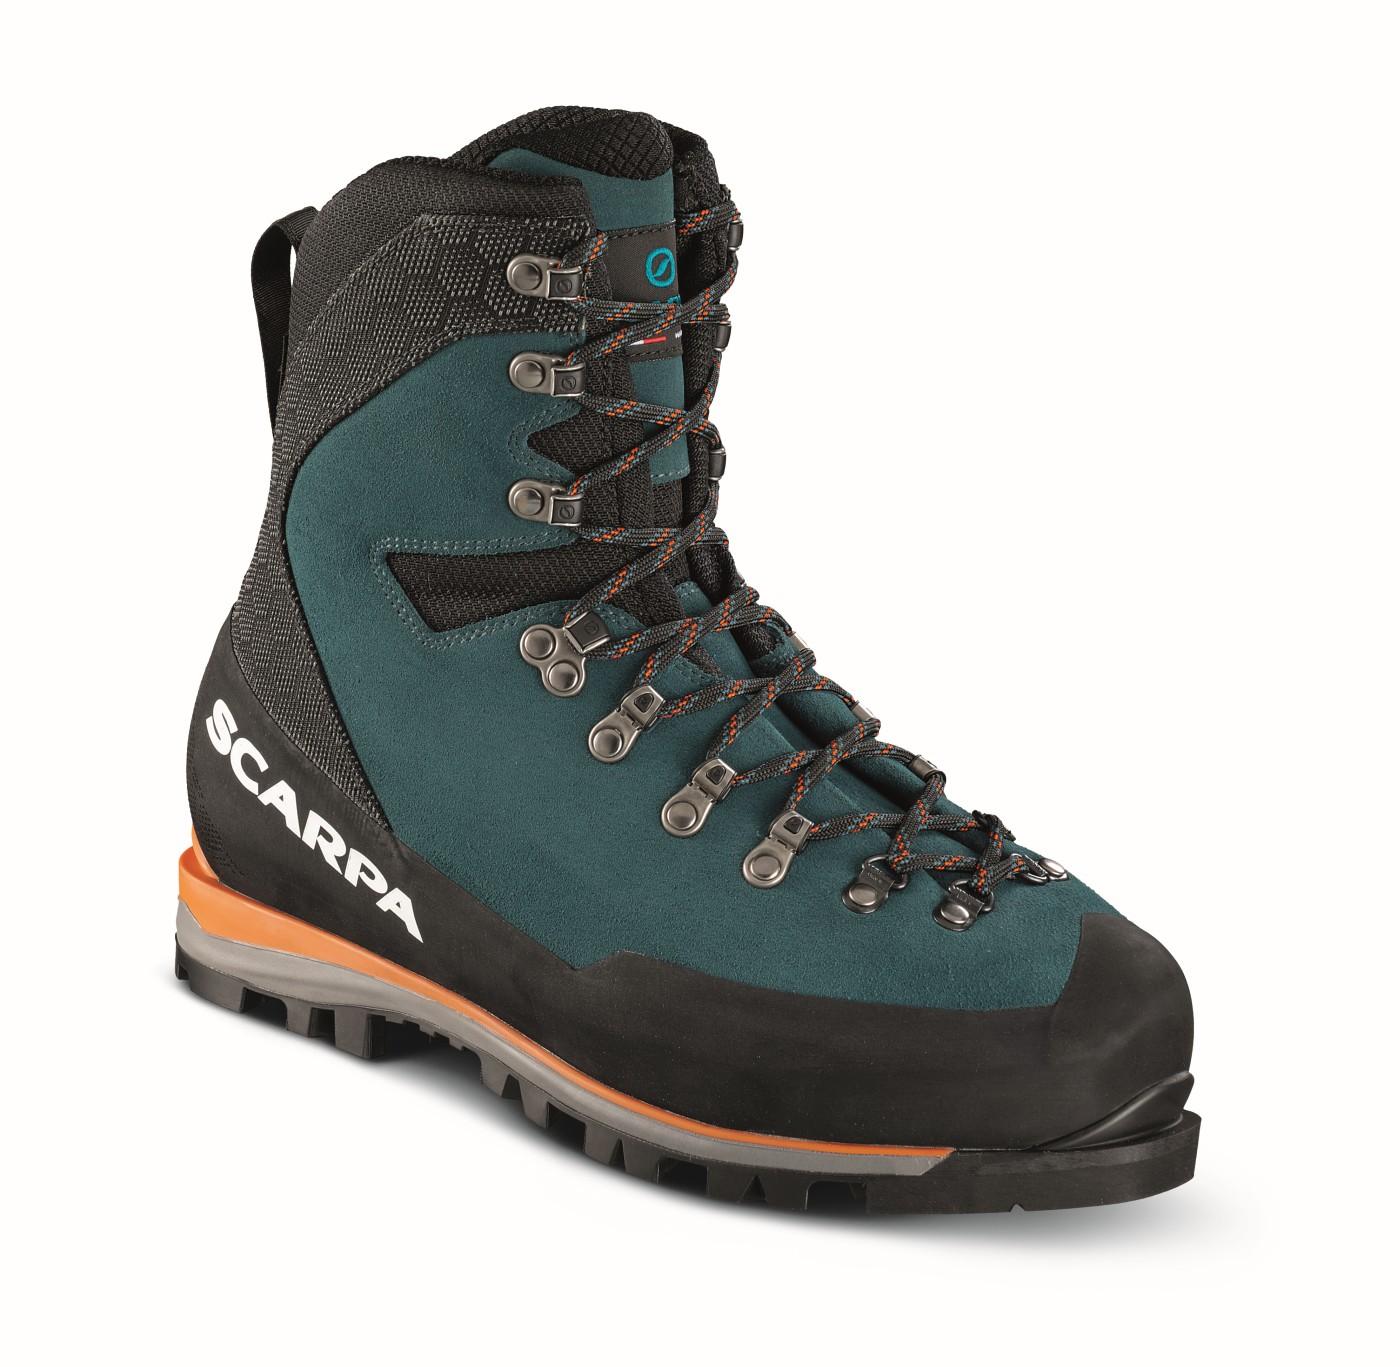 Scarpa Mont Blanc GTX lakeblue-30